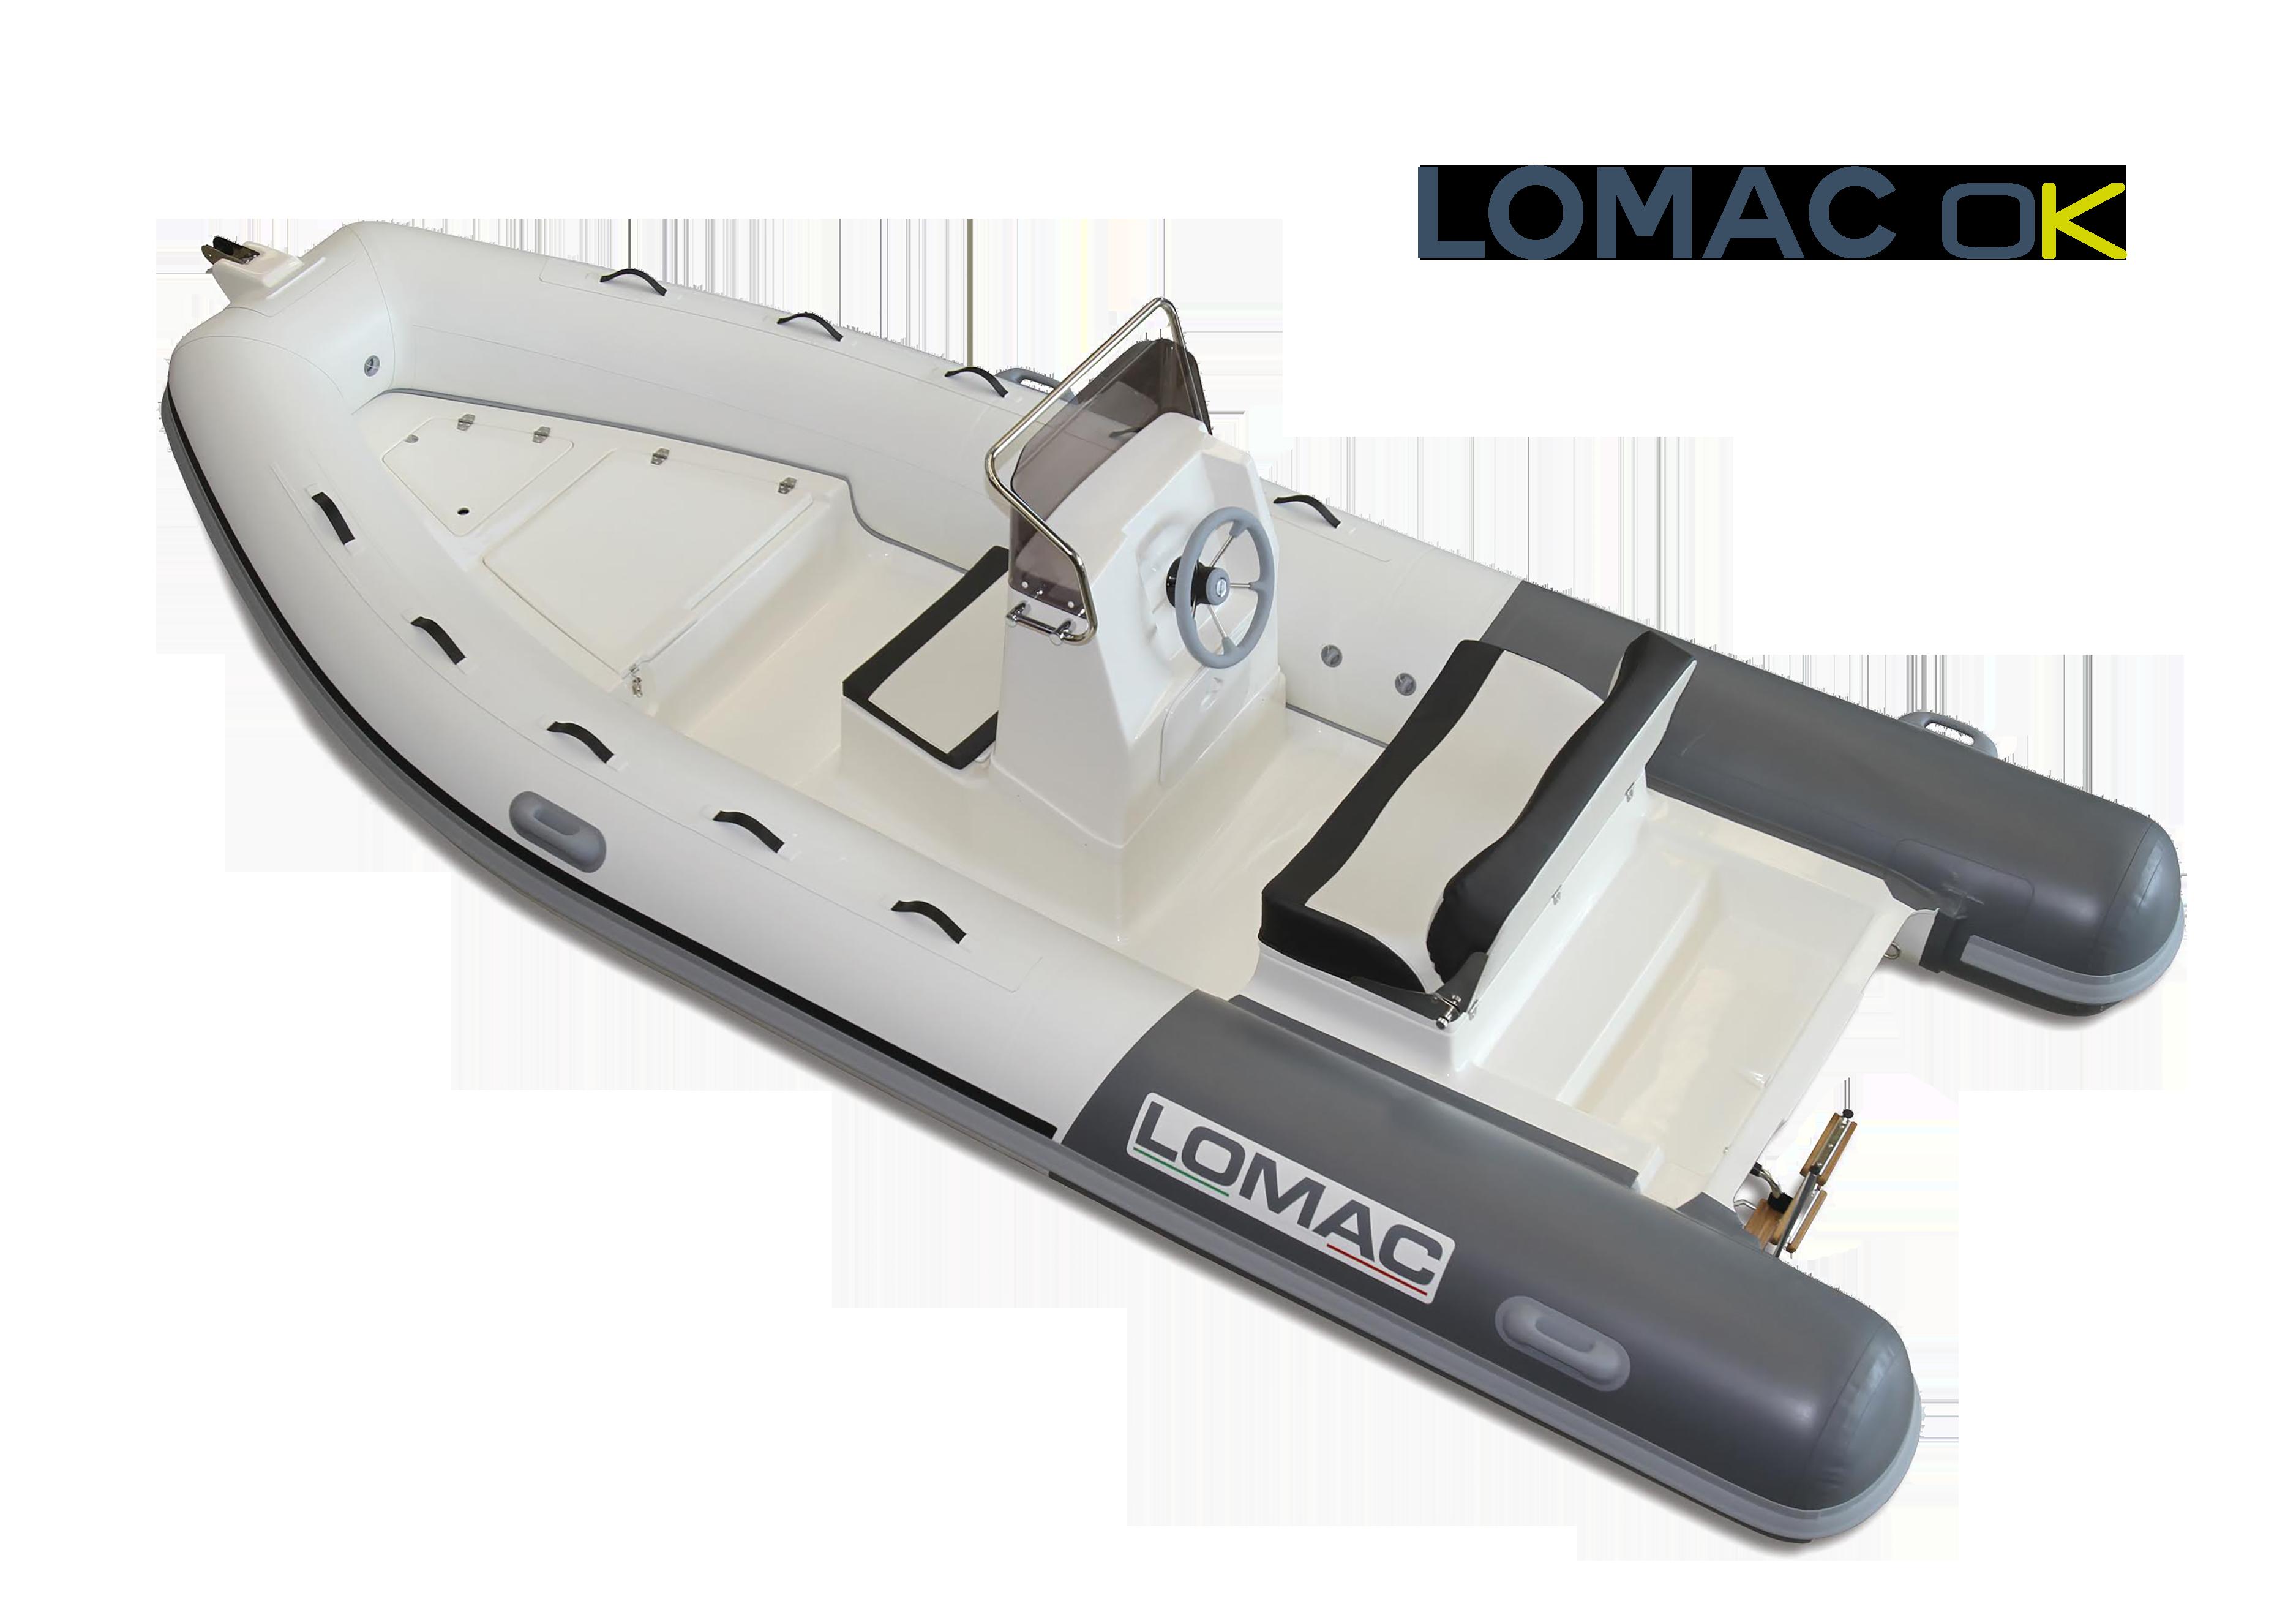 Gamme Semi-rigide Lomac OK Lomac Nautica